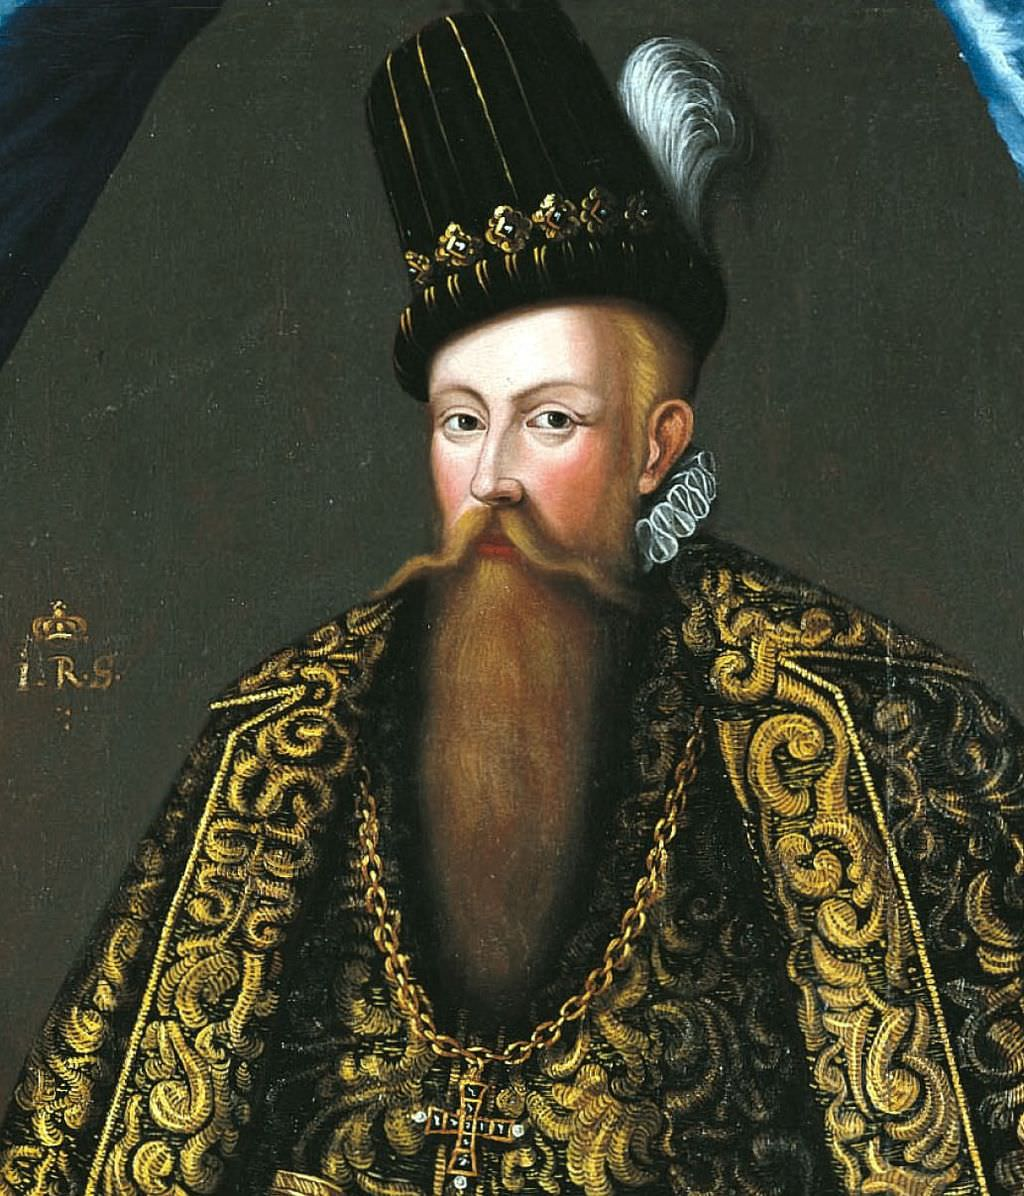 Swedish King John III